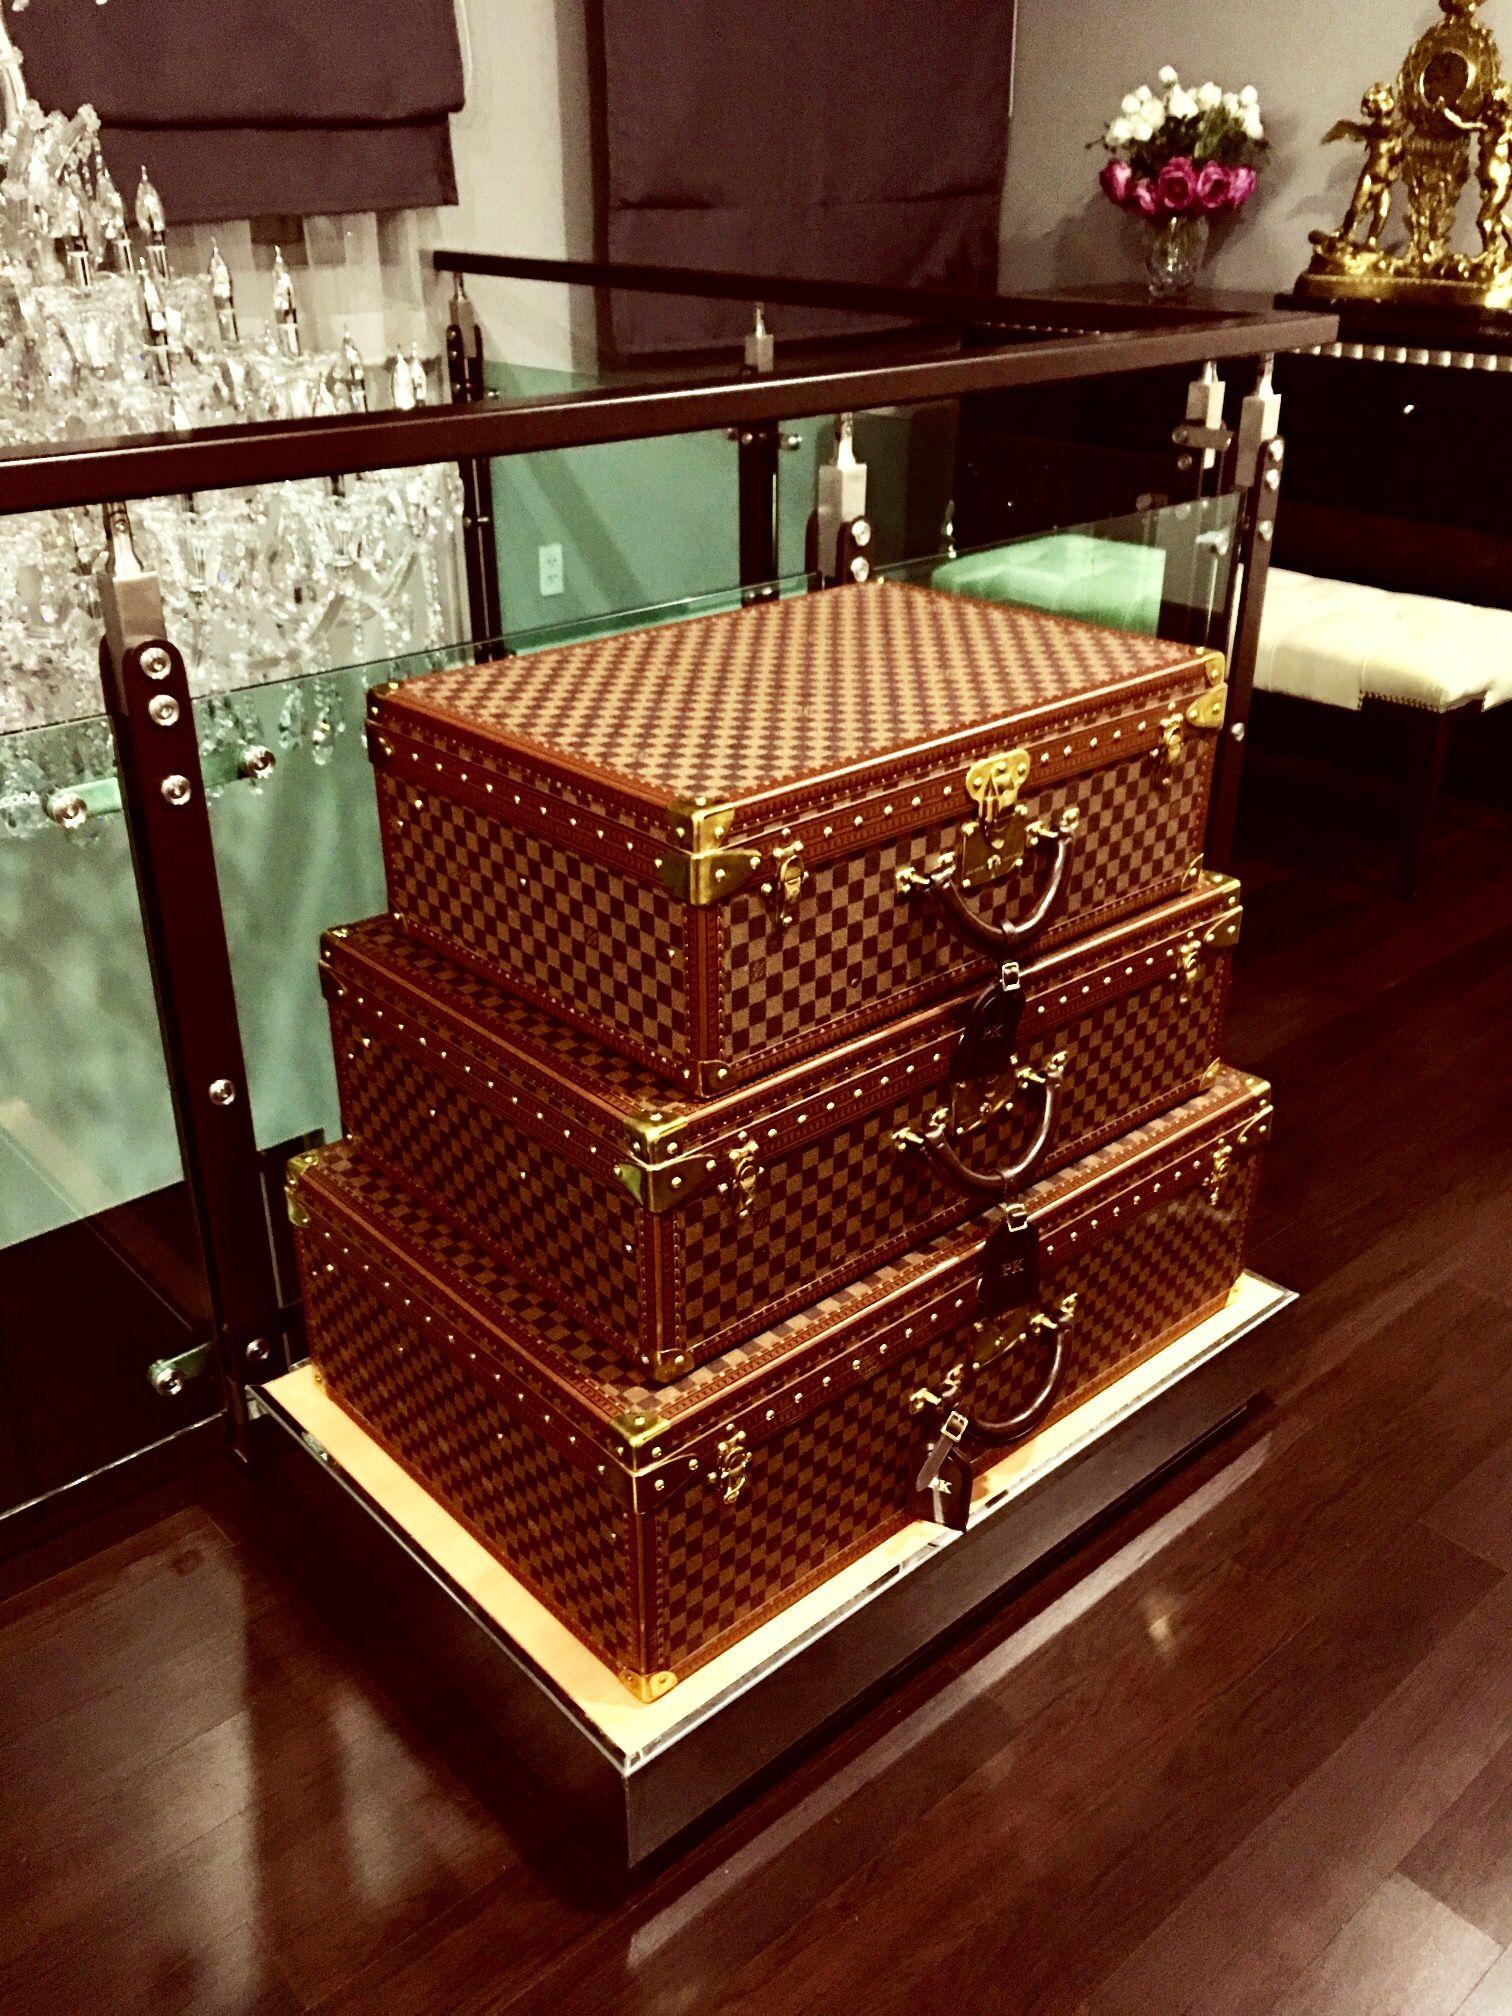 Louis Vuitton Monogram Suitcases Alzer 60 70 80 Kos Home Louis Vuitton Luggage Louis Vuitton Trunk Luxury Purses